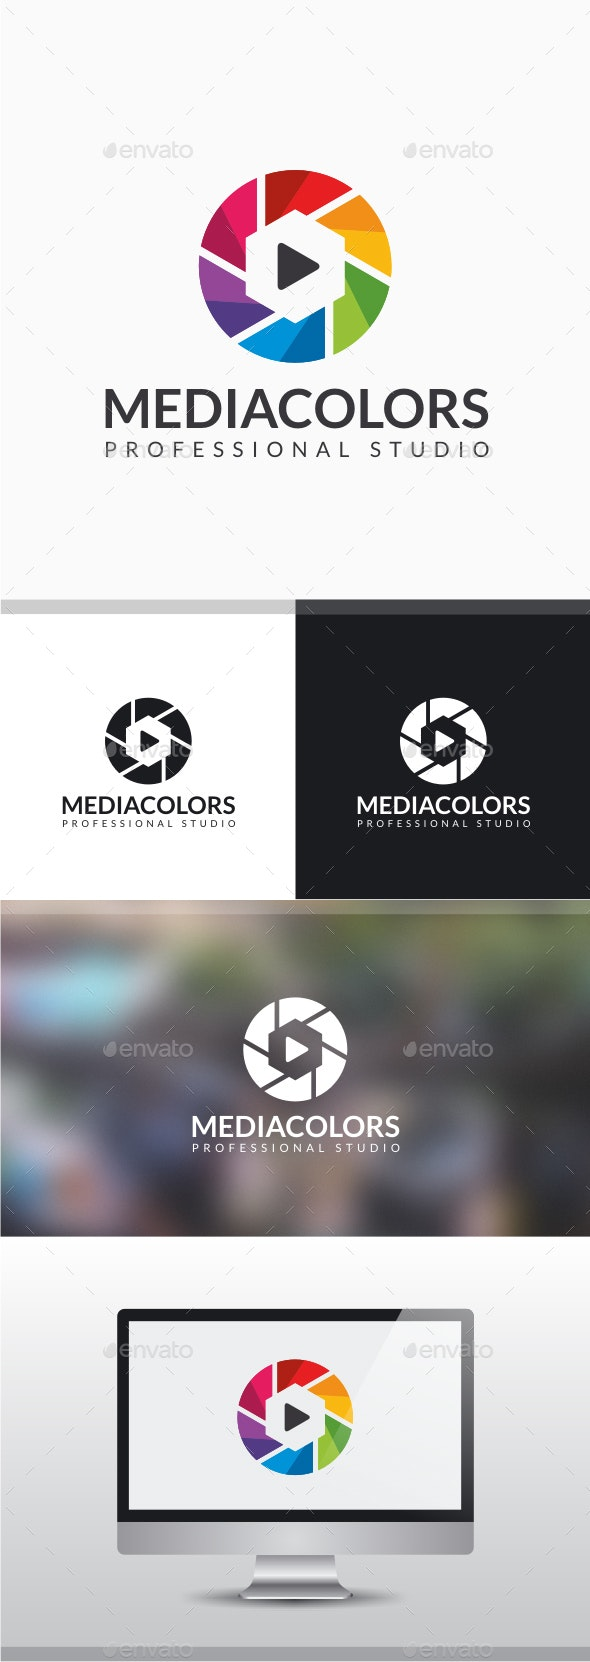 Media Colors Logo - Vector Abstract